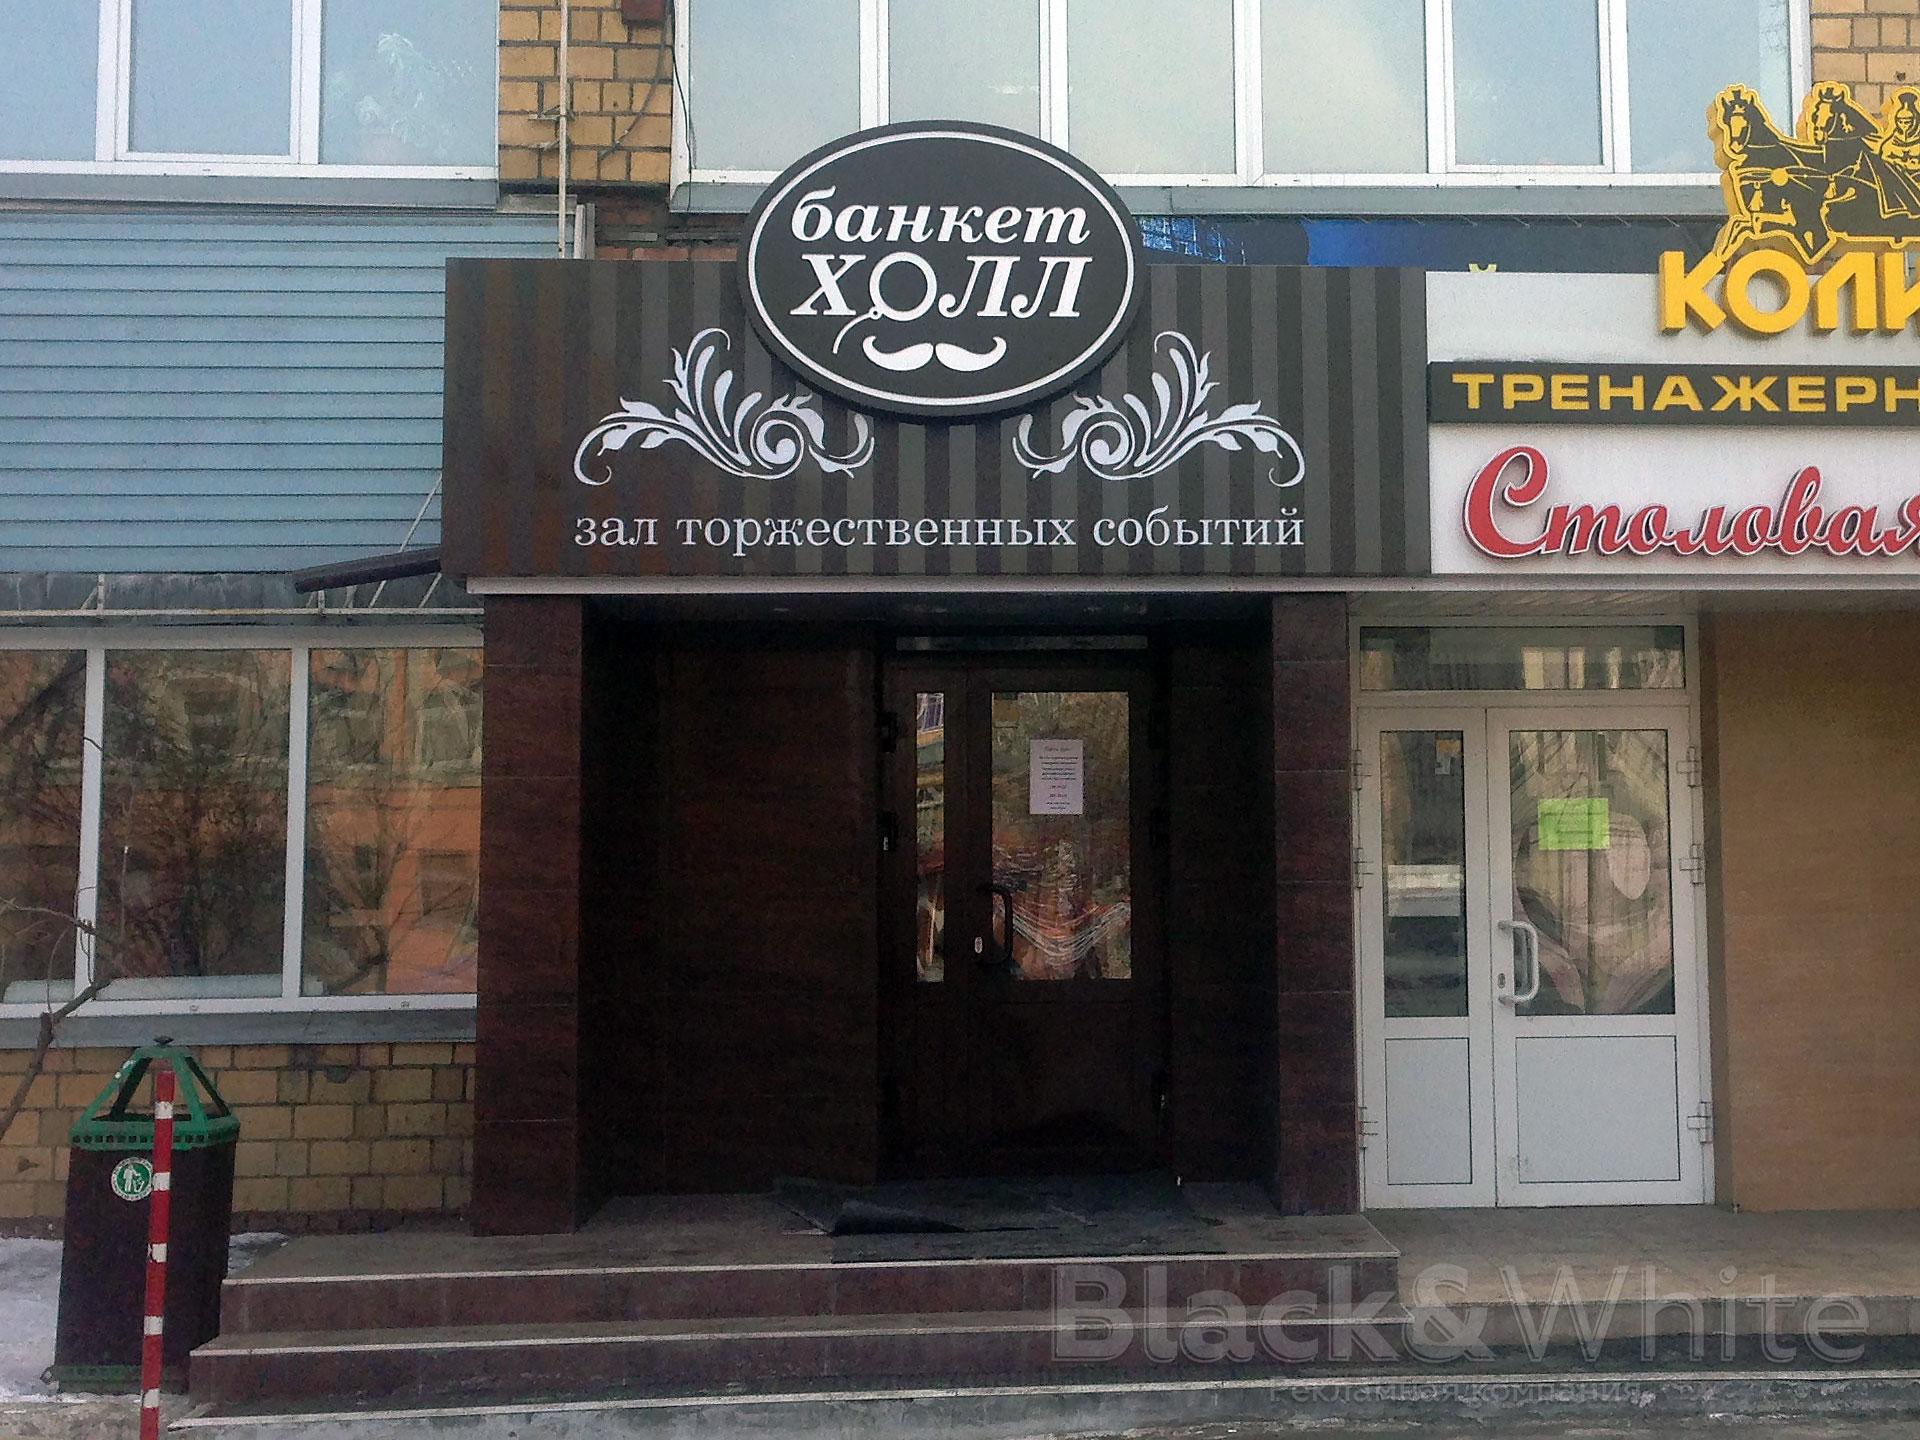 Композитный-короб-Красноярск.jpg